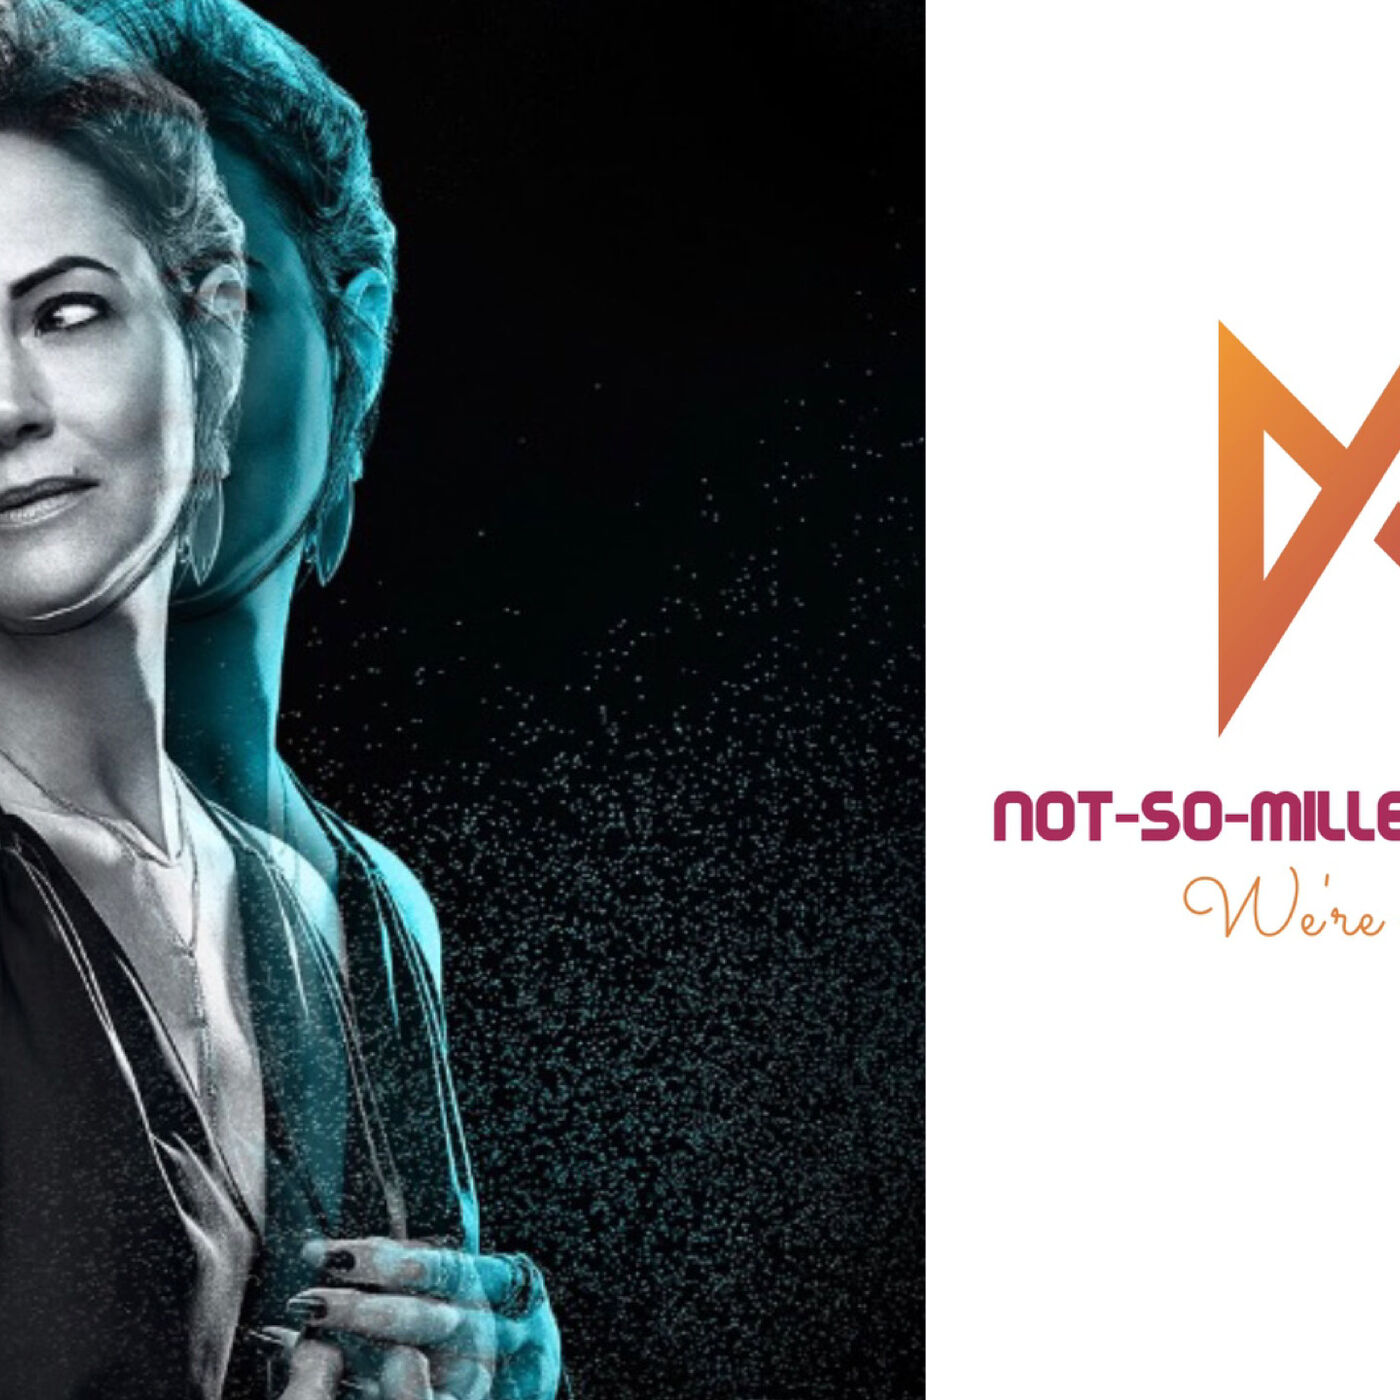 Not-So-Millennial Host Interviews Kingdom Star Joanna Going - Season 2 Ep. 5